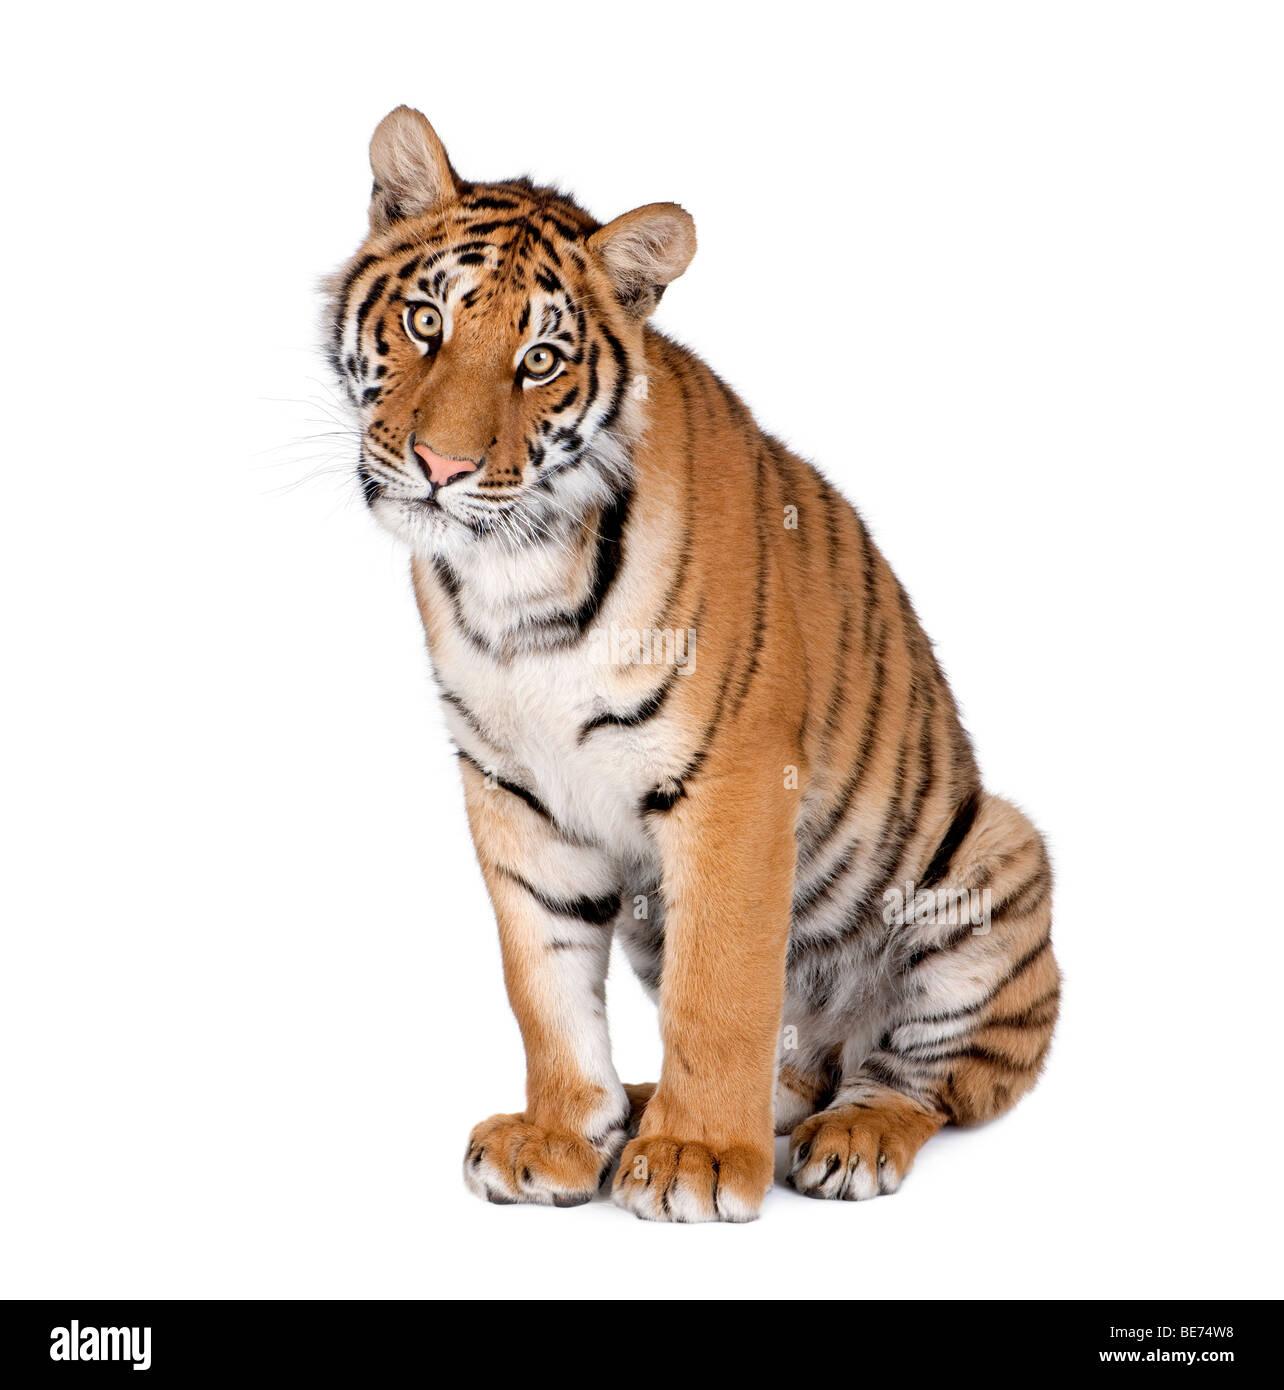 Portrait of Bengal Tiger, Panthera tigris tigris, 1 year old, sitting in front of white background, studio shot - Stock Image